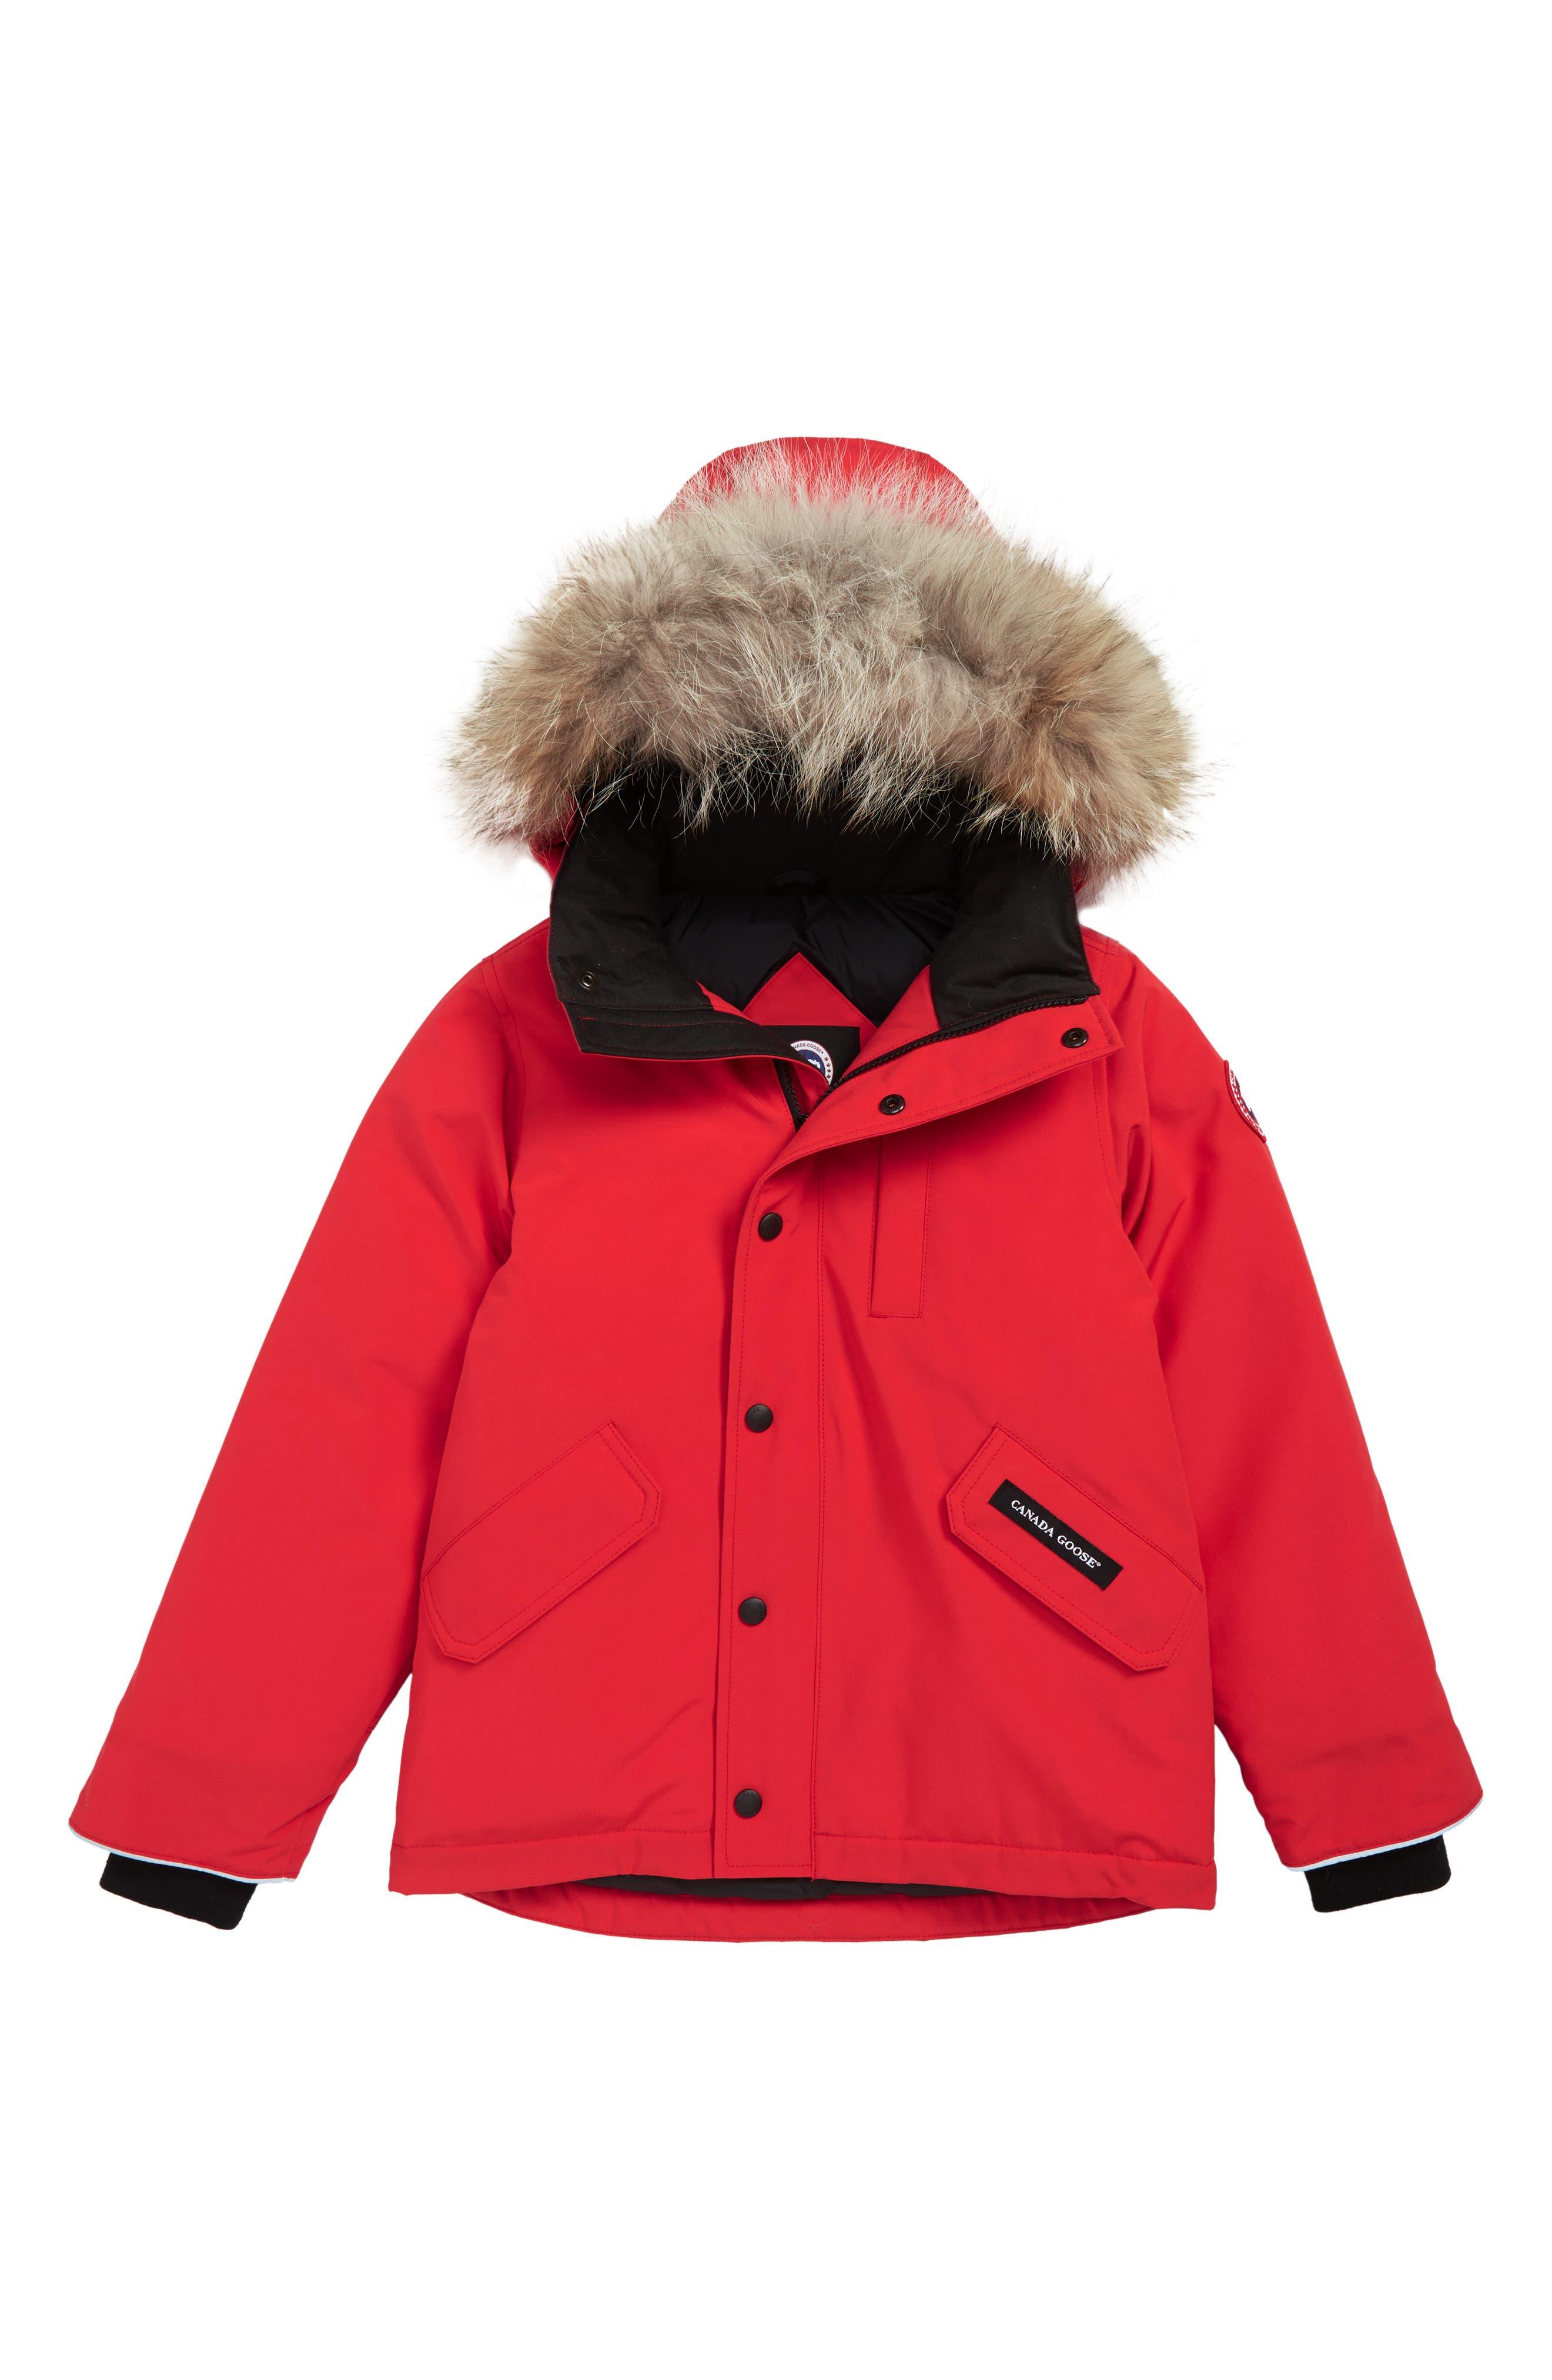 canada goose red jacket nike